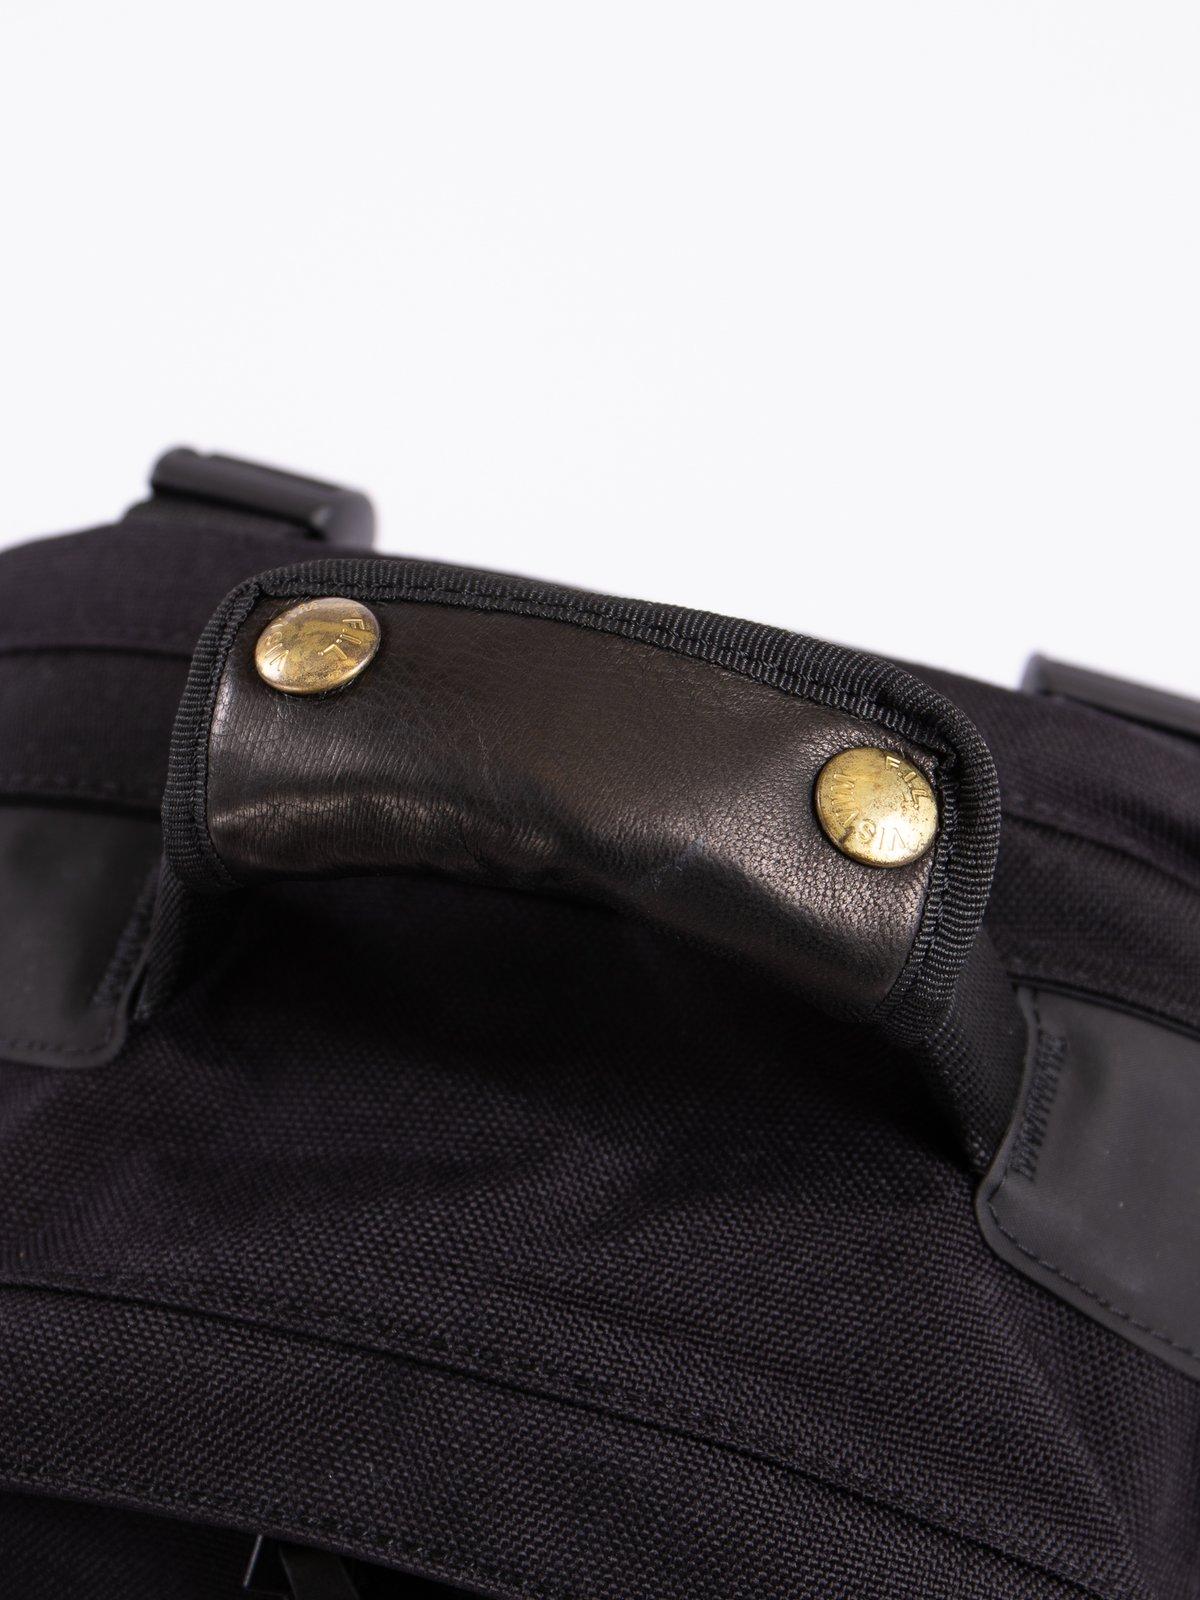 Black Fra Veg Lamb 22L Cordura Backpack - Image 4